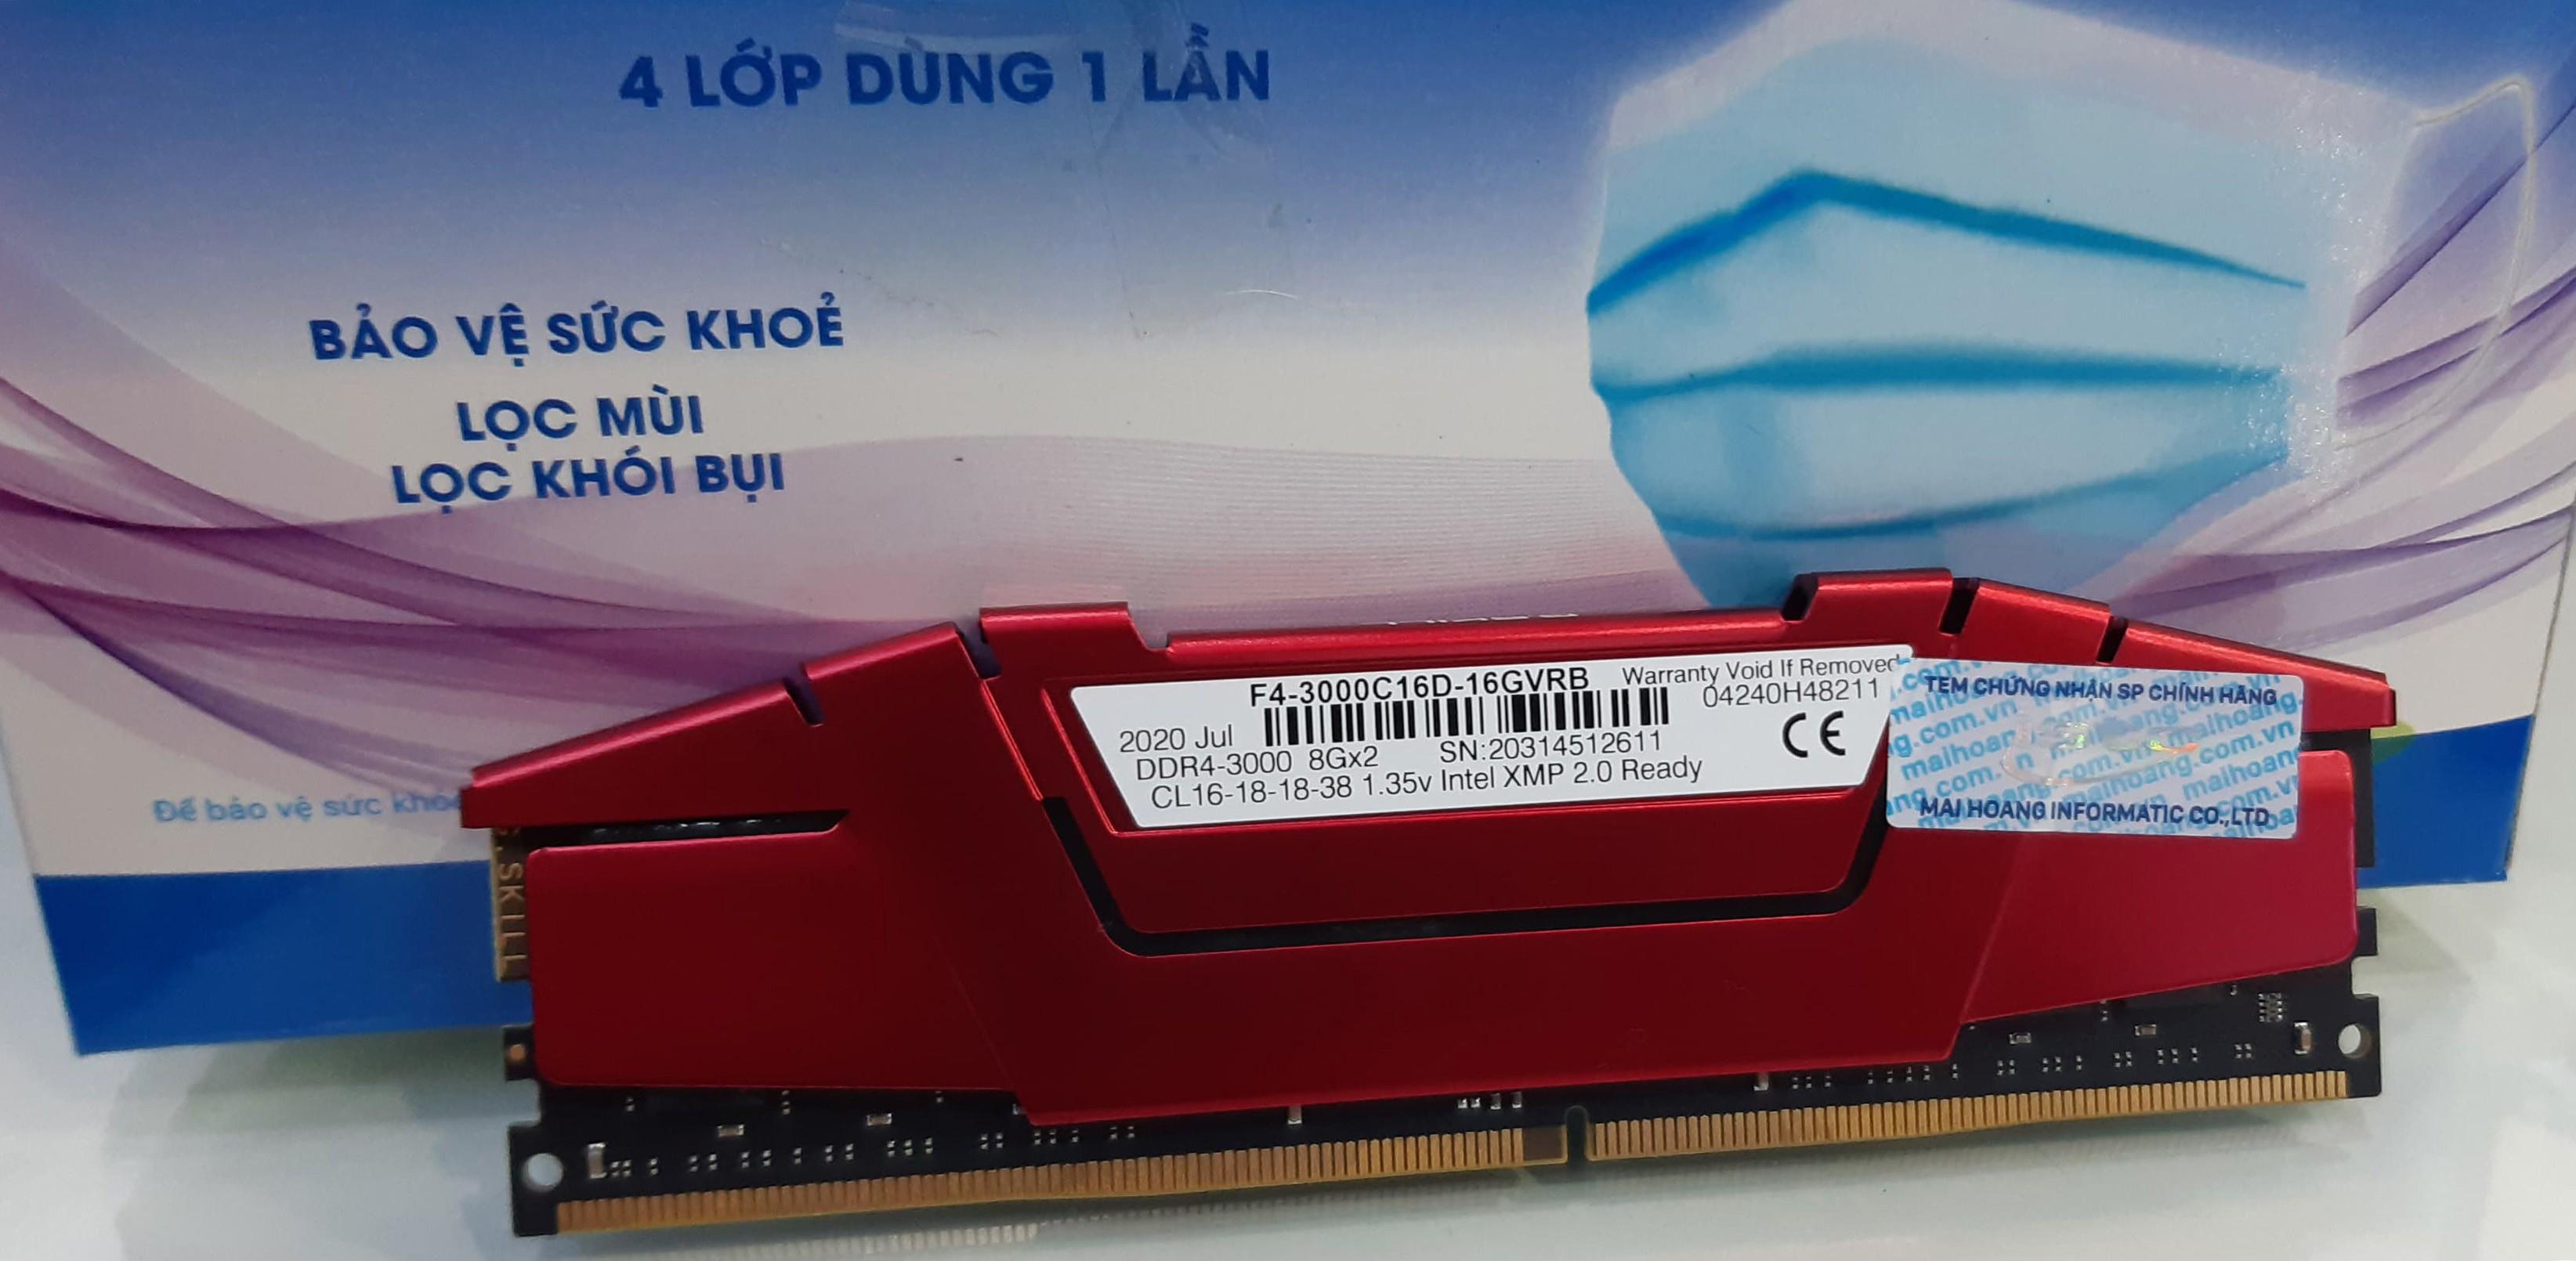 RAM G.Skill RIPJAWS V 8GB (8GBx1) Bus 3000MHz Cas16